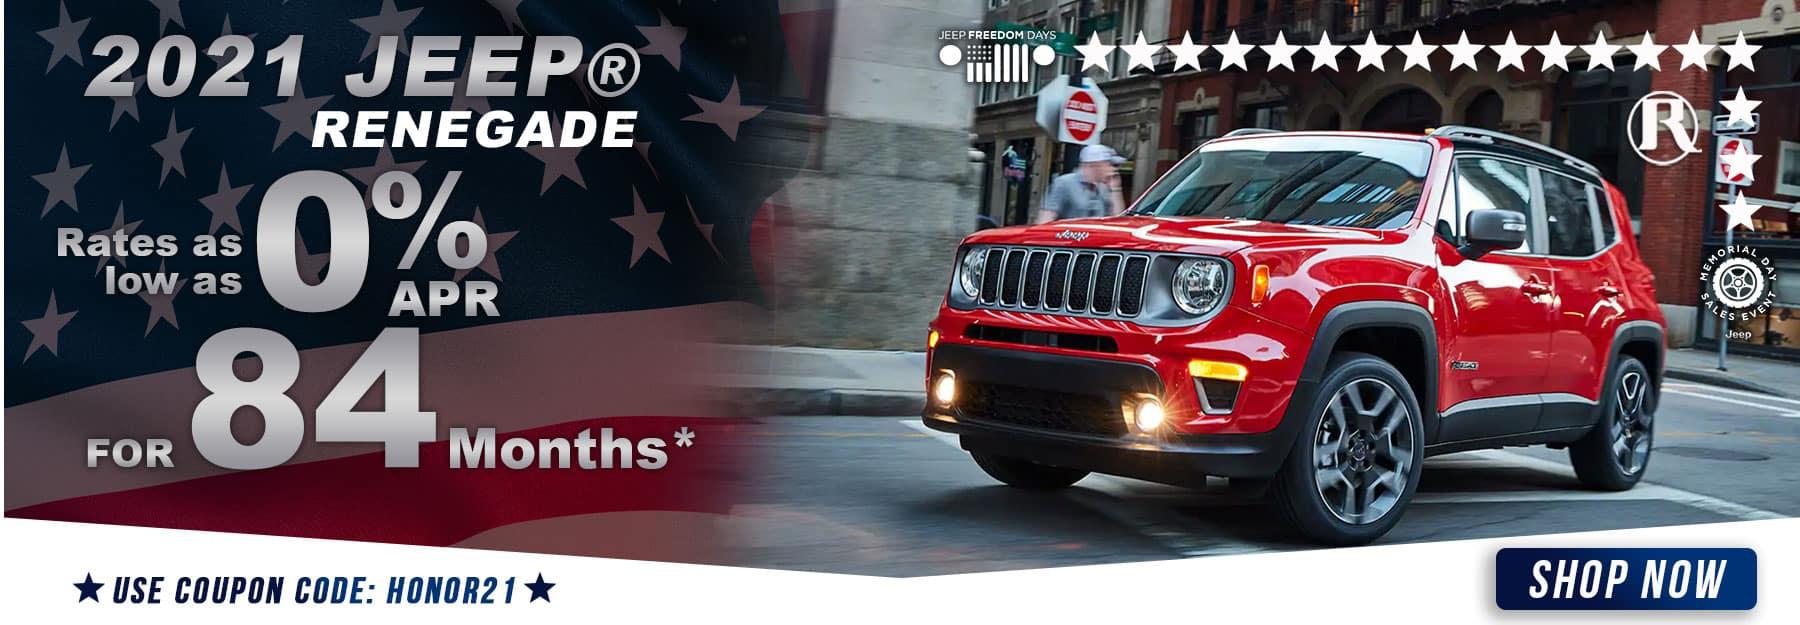 2021 Jeep Renegade Reed Jeep Kansas City